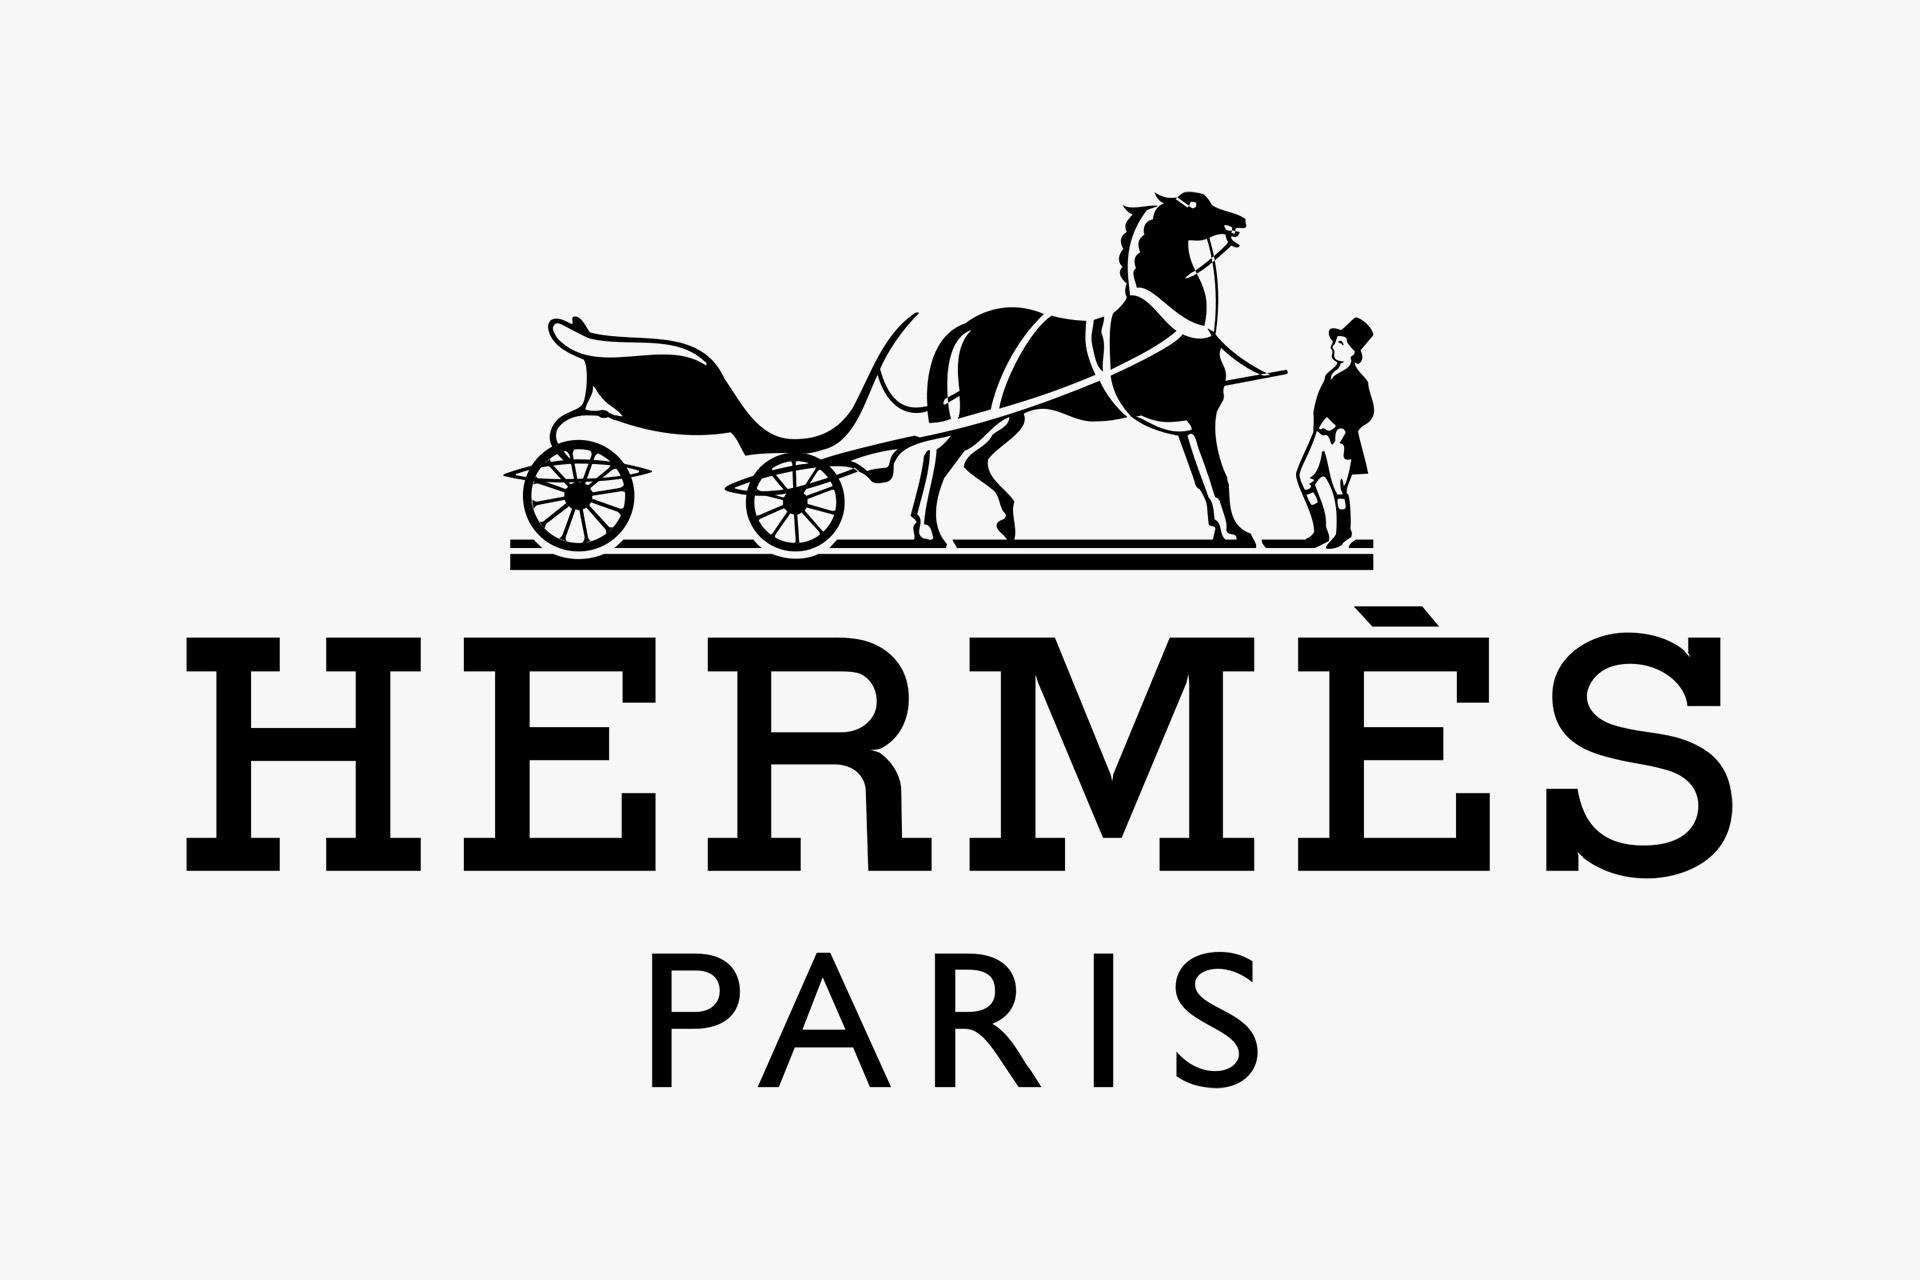 image logo hermes